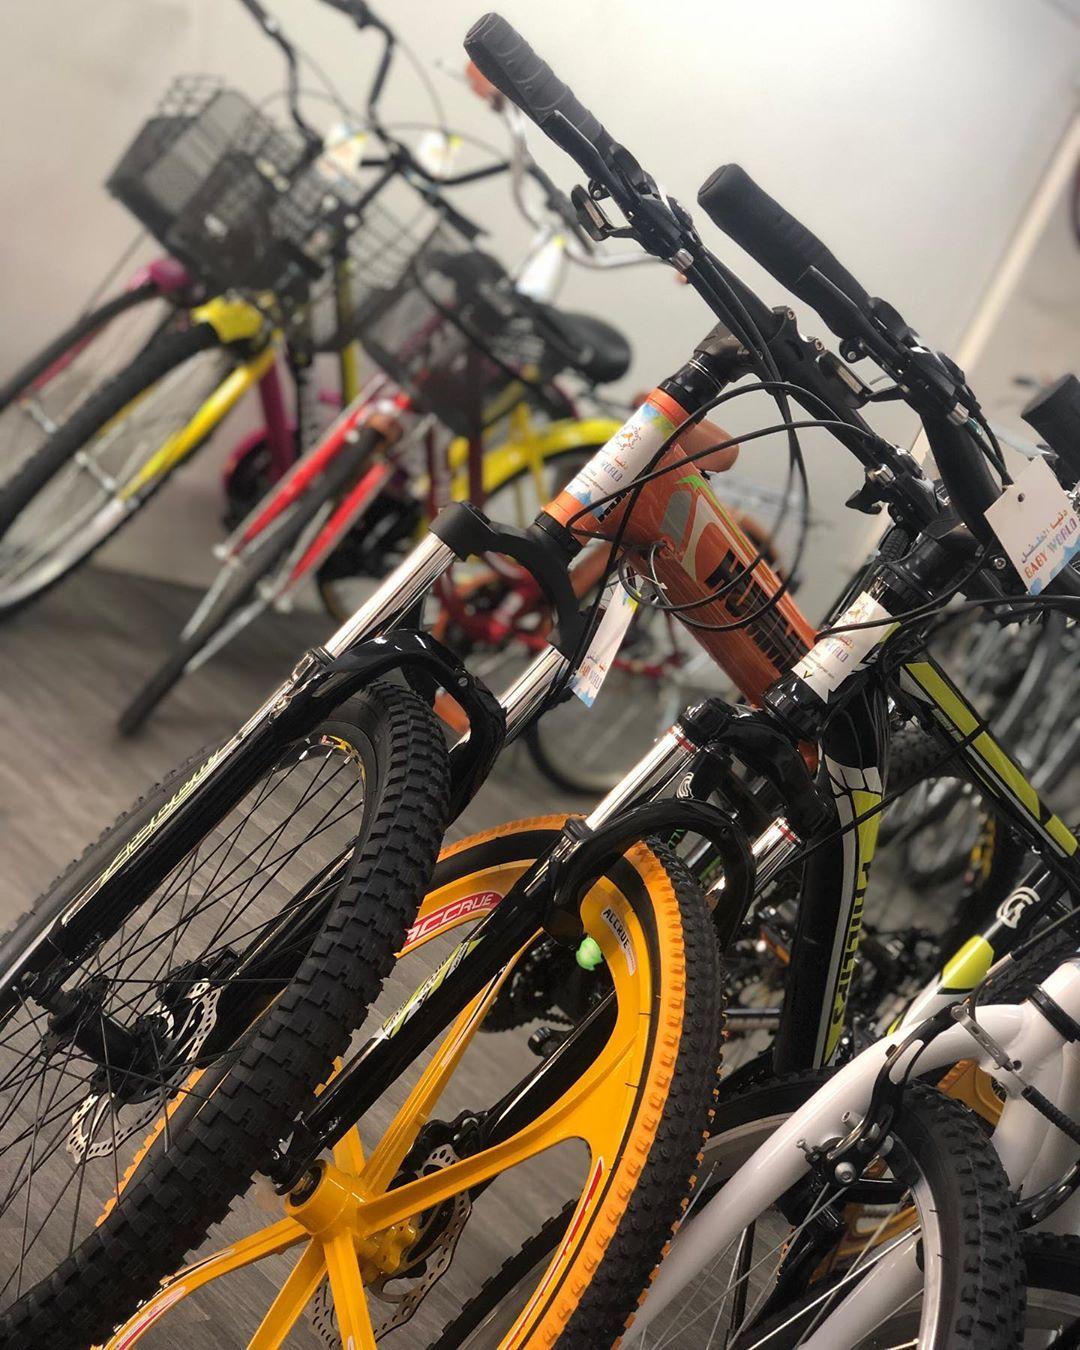 Bahrain Bikers Babyworld Bicycles Store Riffa Bahrain Sports Ironman دنيا الطفل Bikes Repair Toys دراجات البحرين س Bicycle Lover Bicycle Vehicles